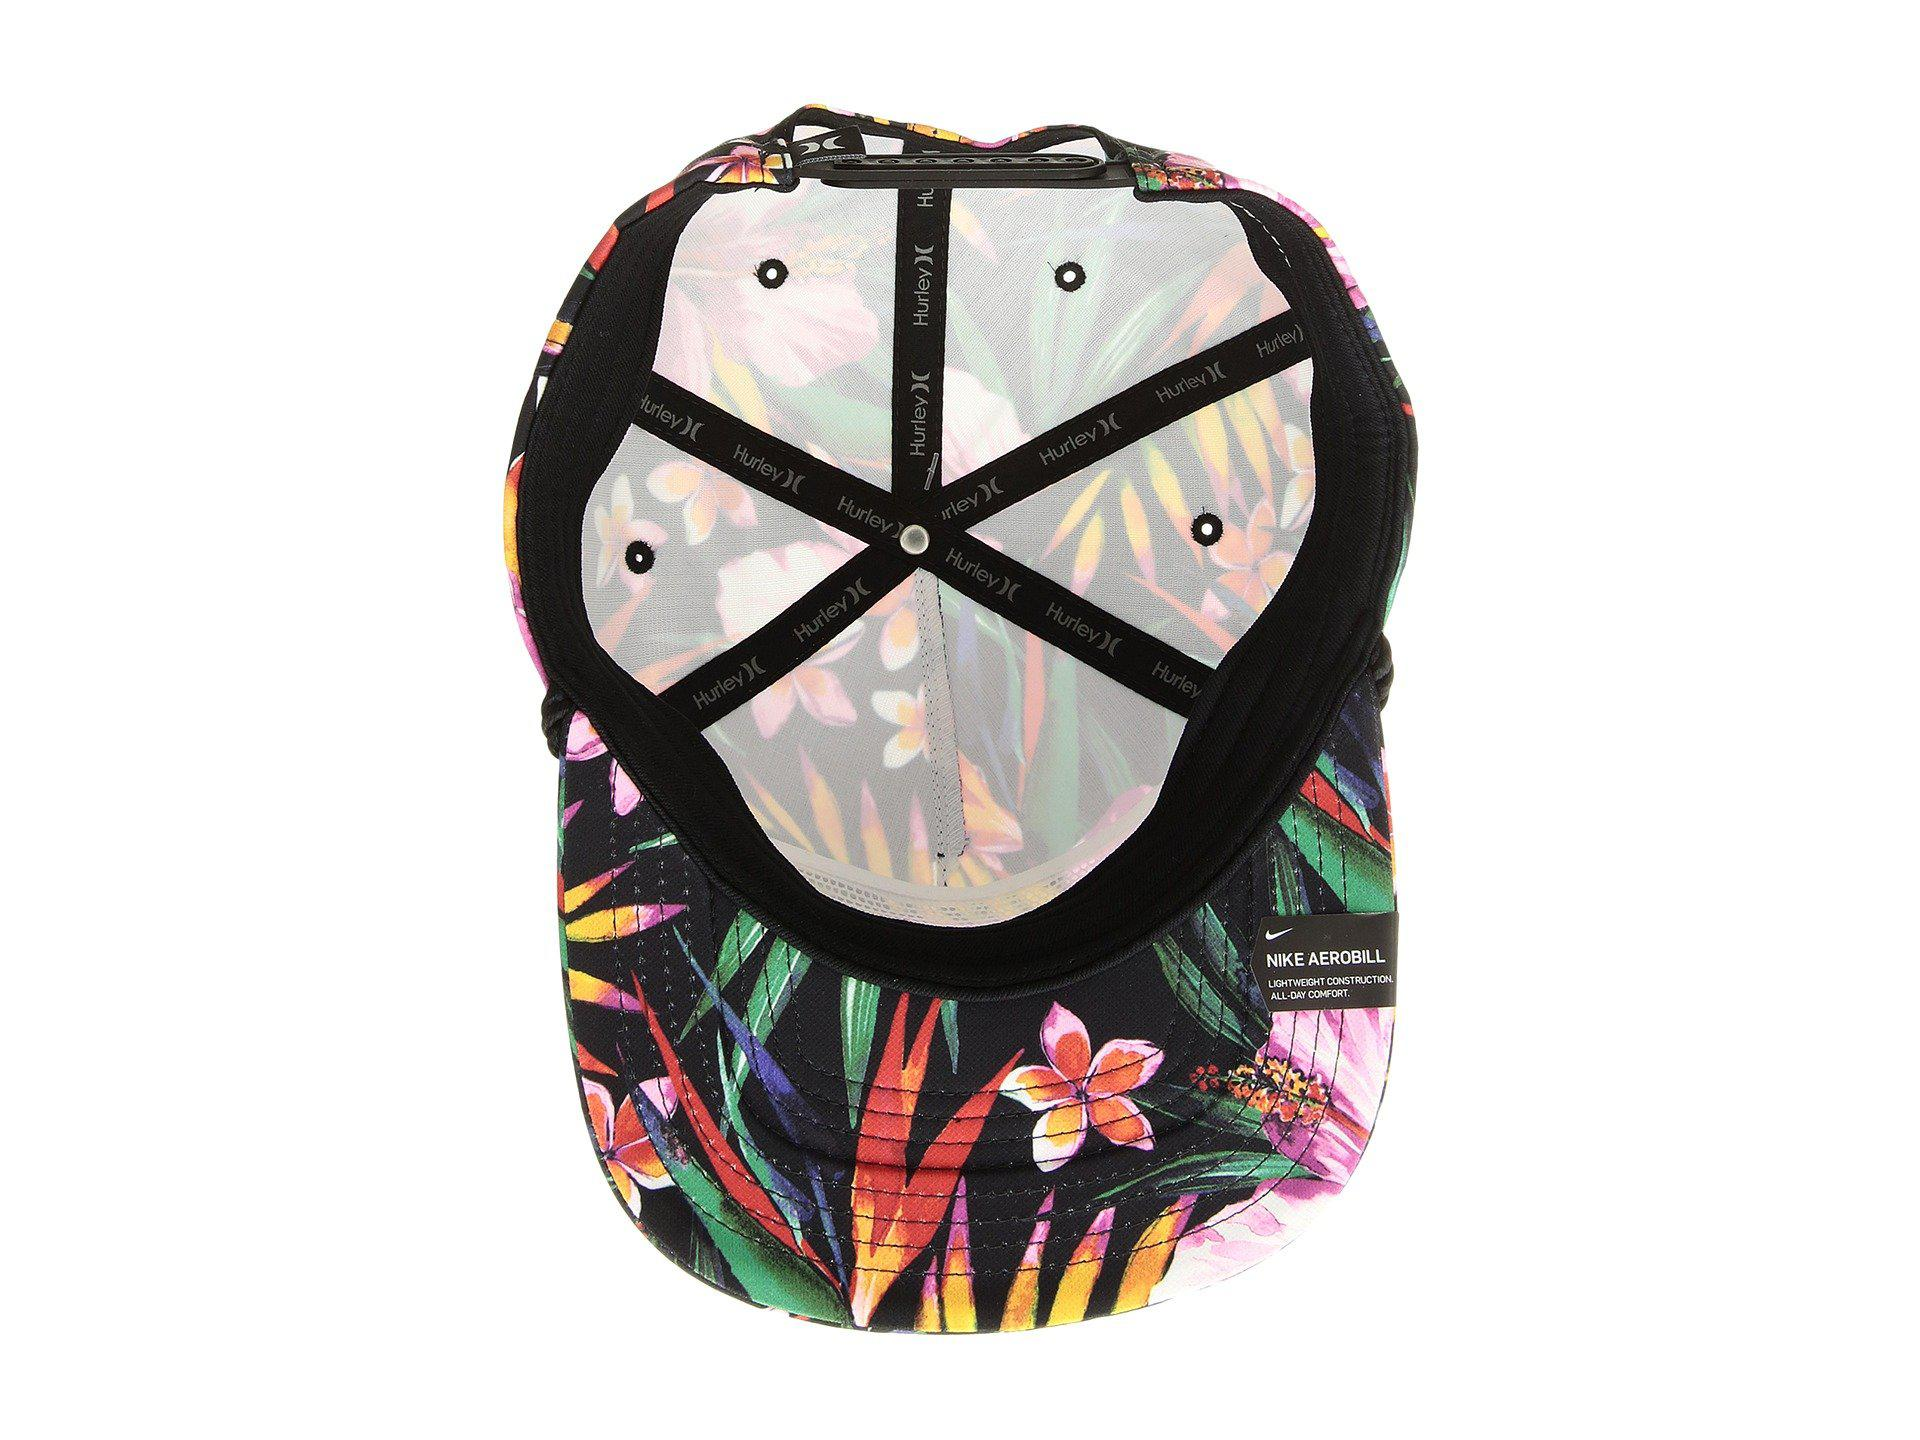 promo code 0fe4e 75706 Hurley Dri-fit Garden Hat (black) Caps in Black for Men - Lyst